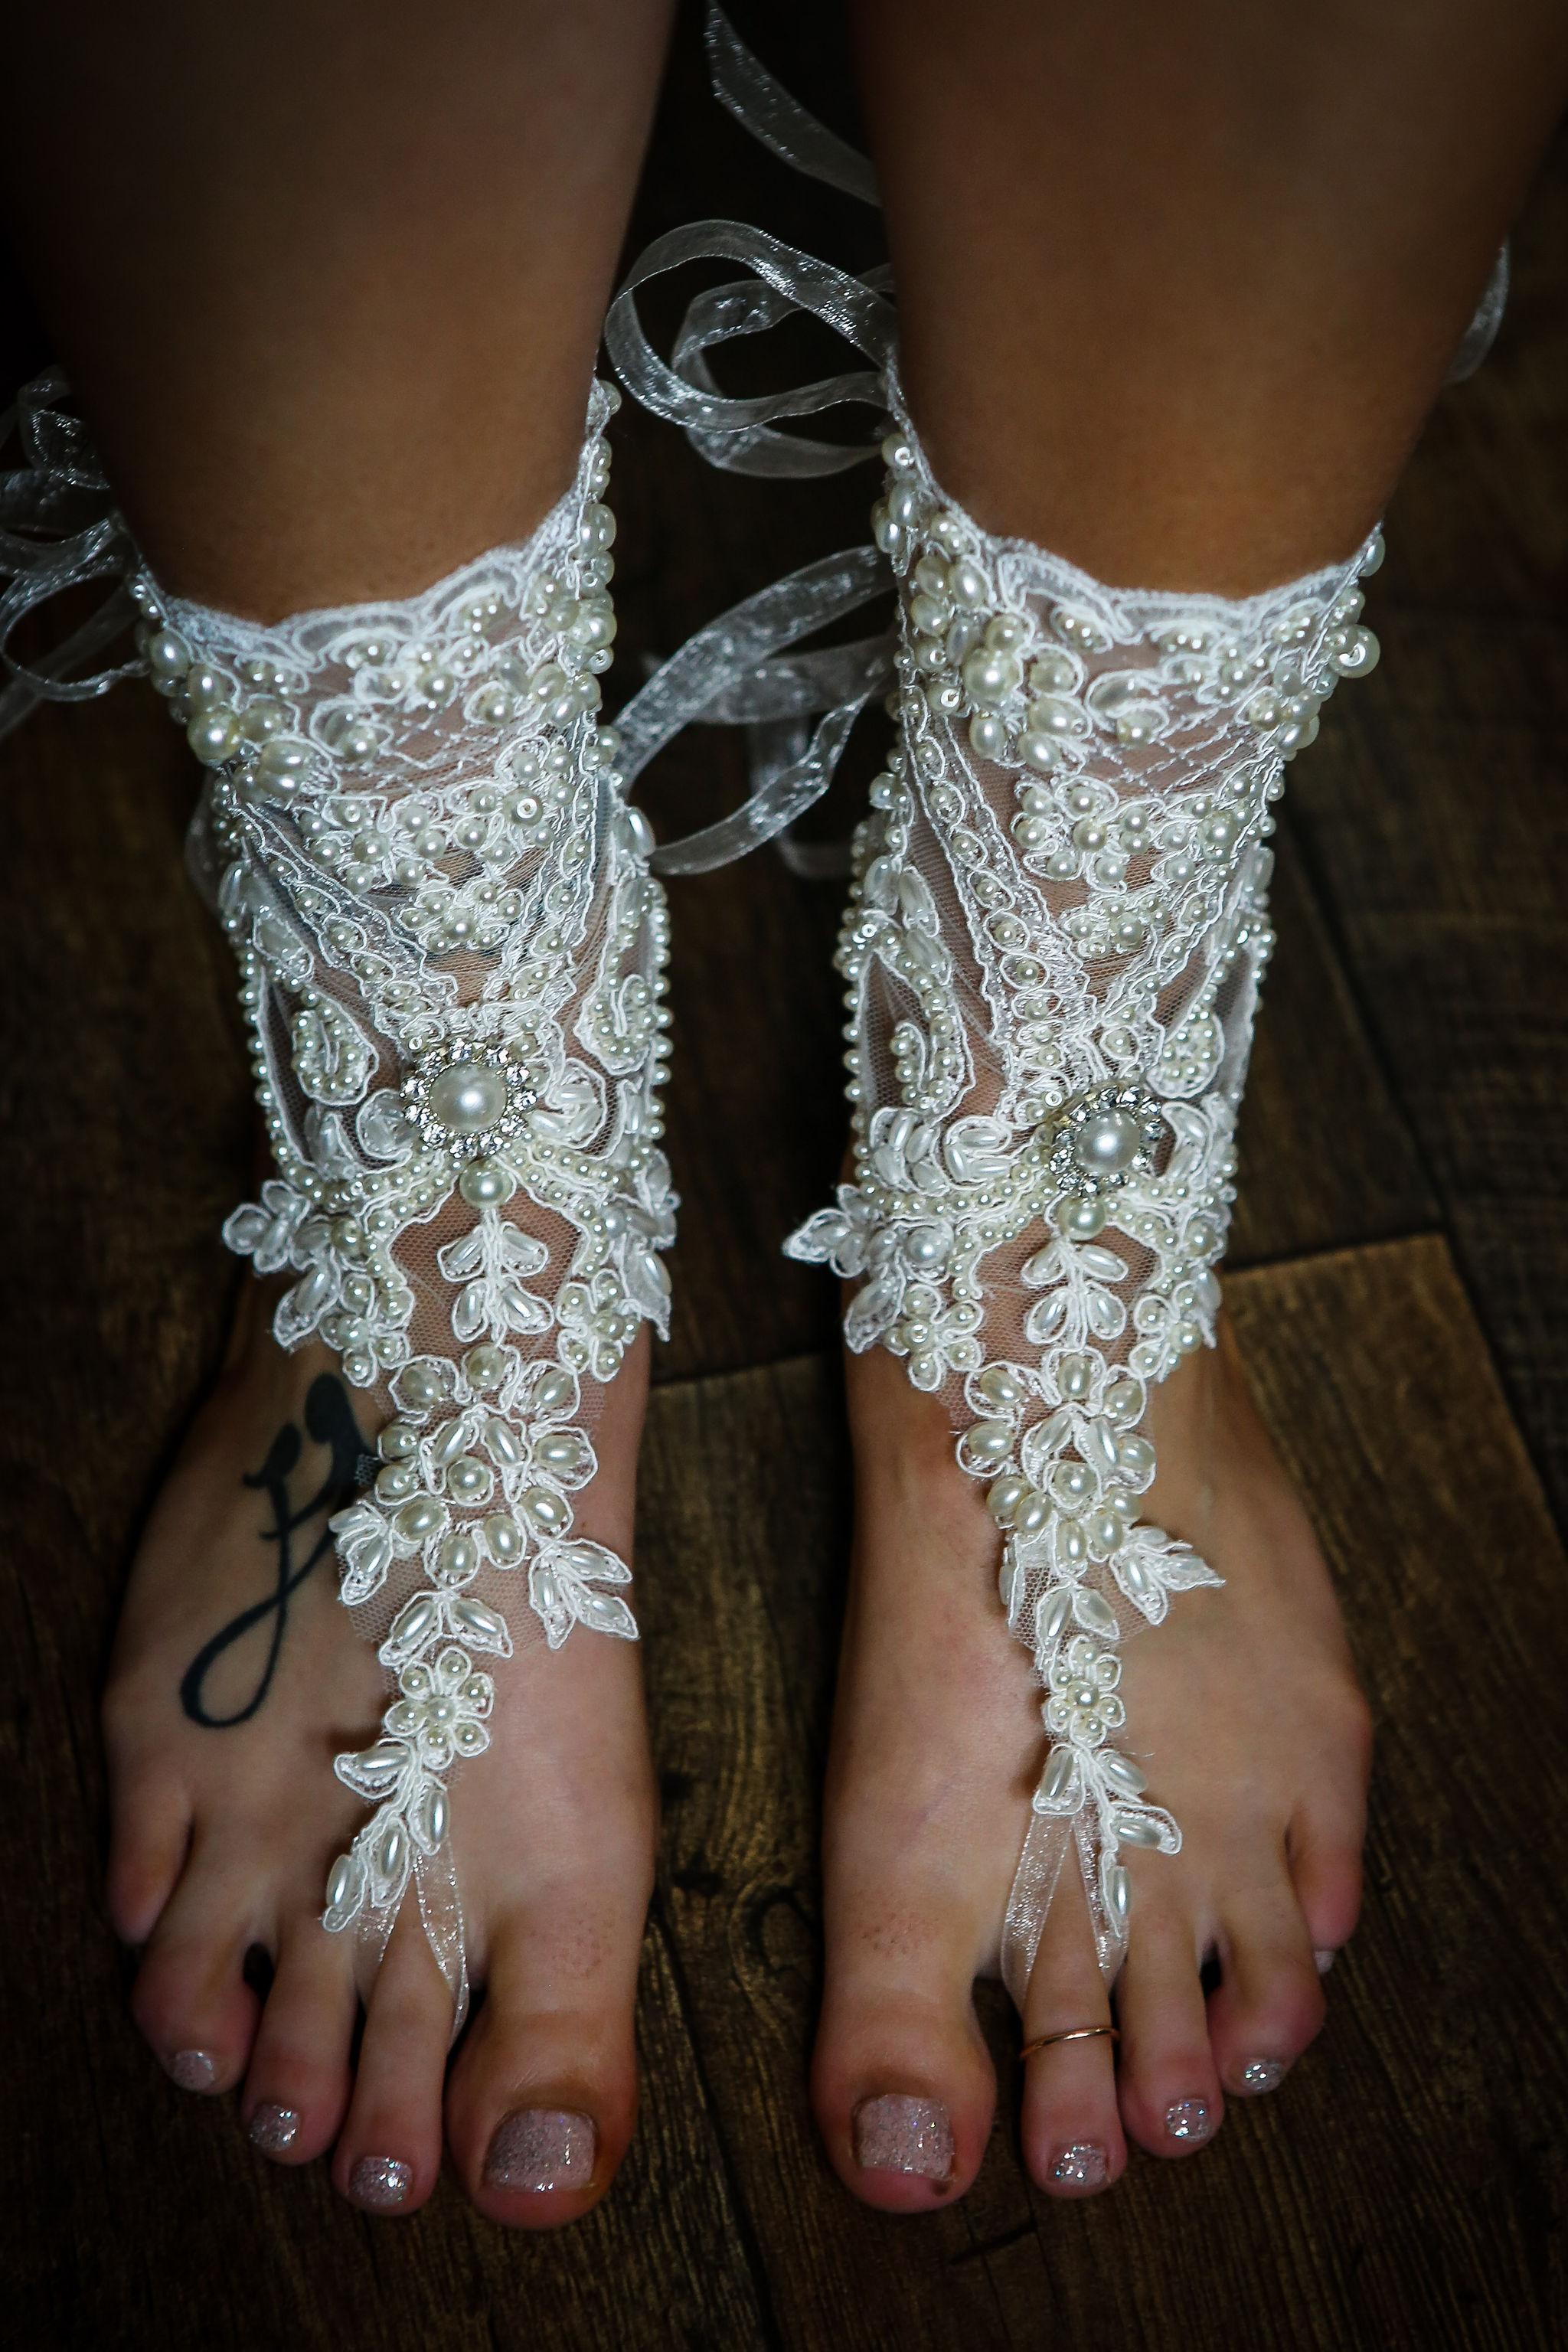 Harriet&Rhys Wedding - lace wedding footwear - wedding accessories